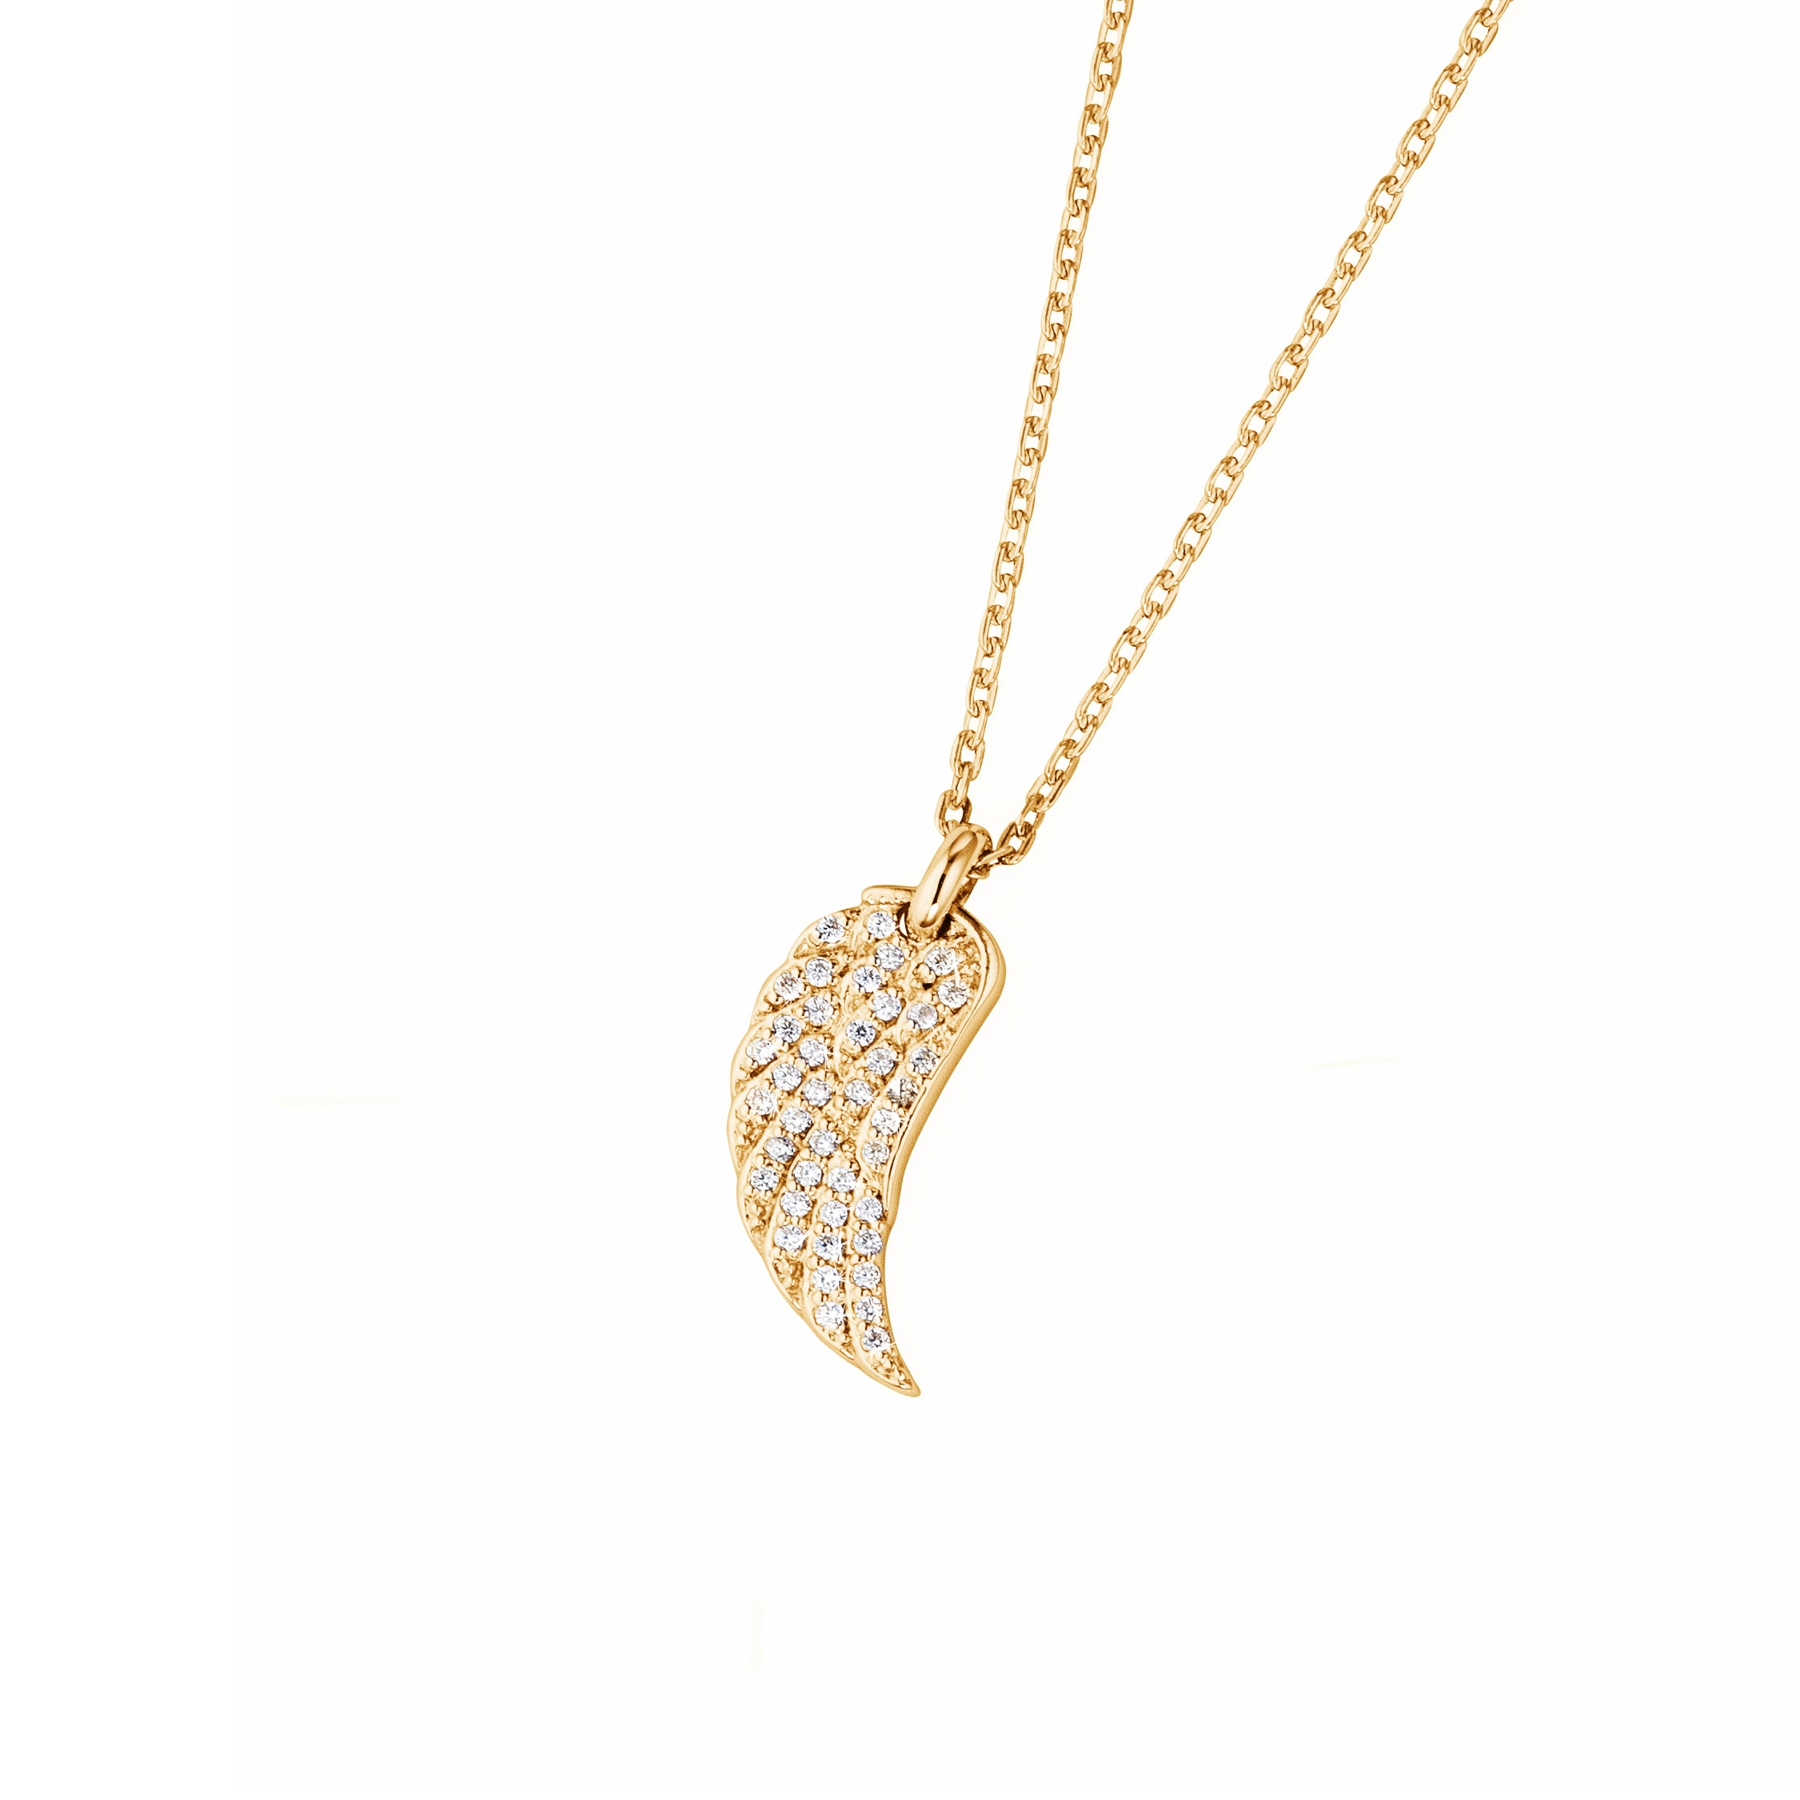 cefa64c2e4c3 DOOSTI Zarte Halskette Flügel 925 Silber Gelbgold vergoldet   DOOSTI